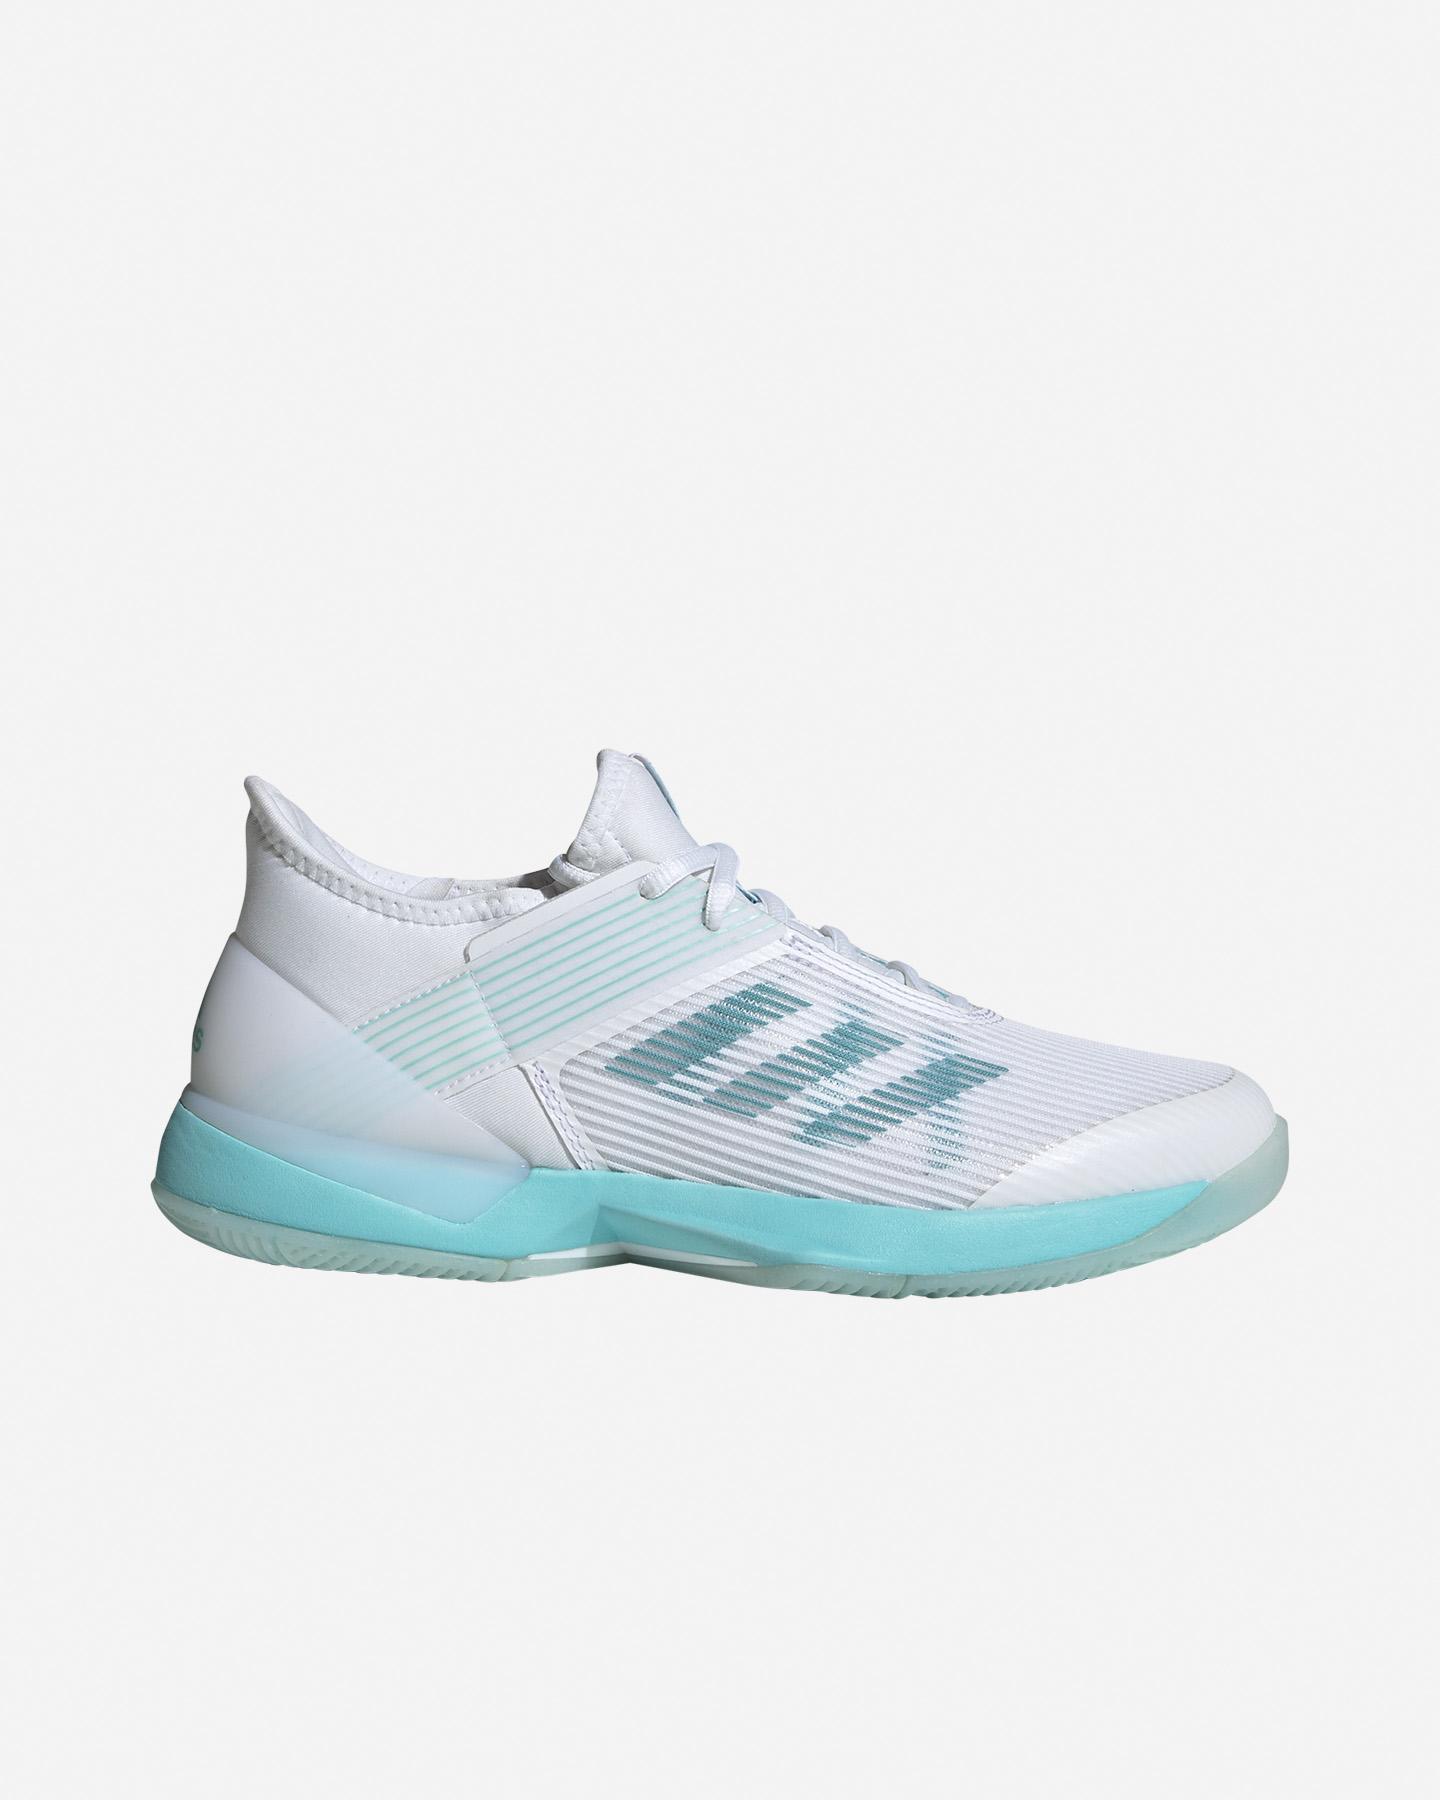 scarpe da tennis adidas prezzi